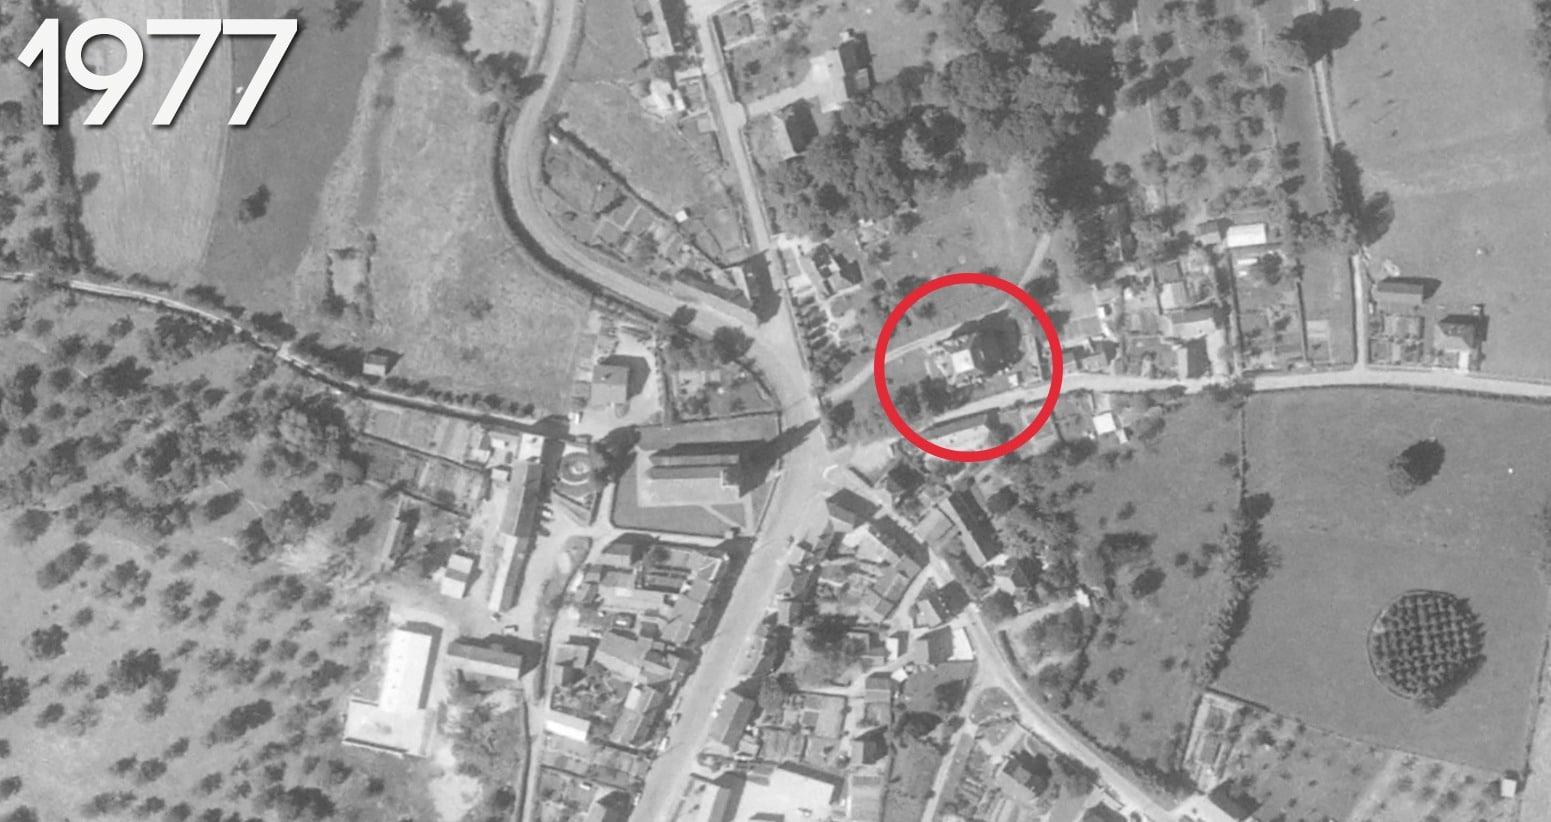 chateau-samsonova-map-1977